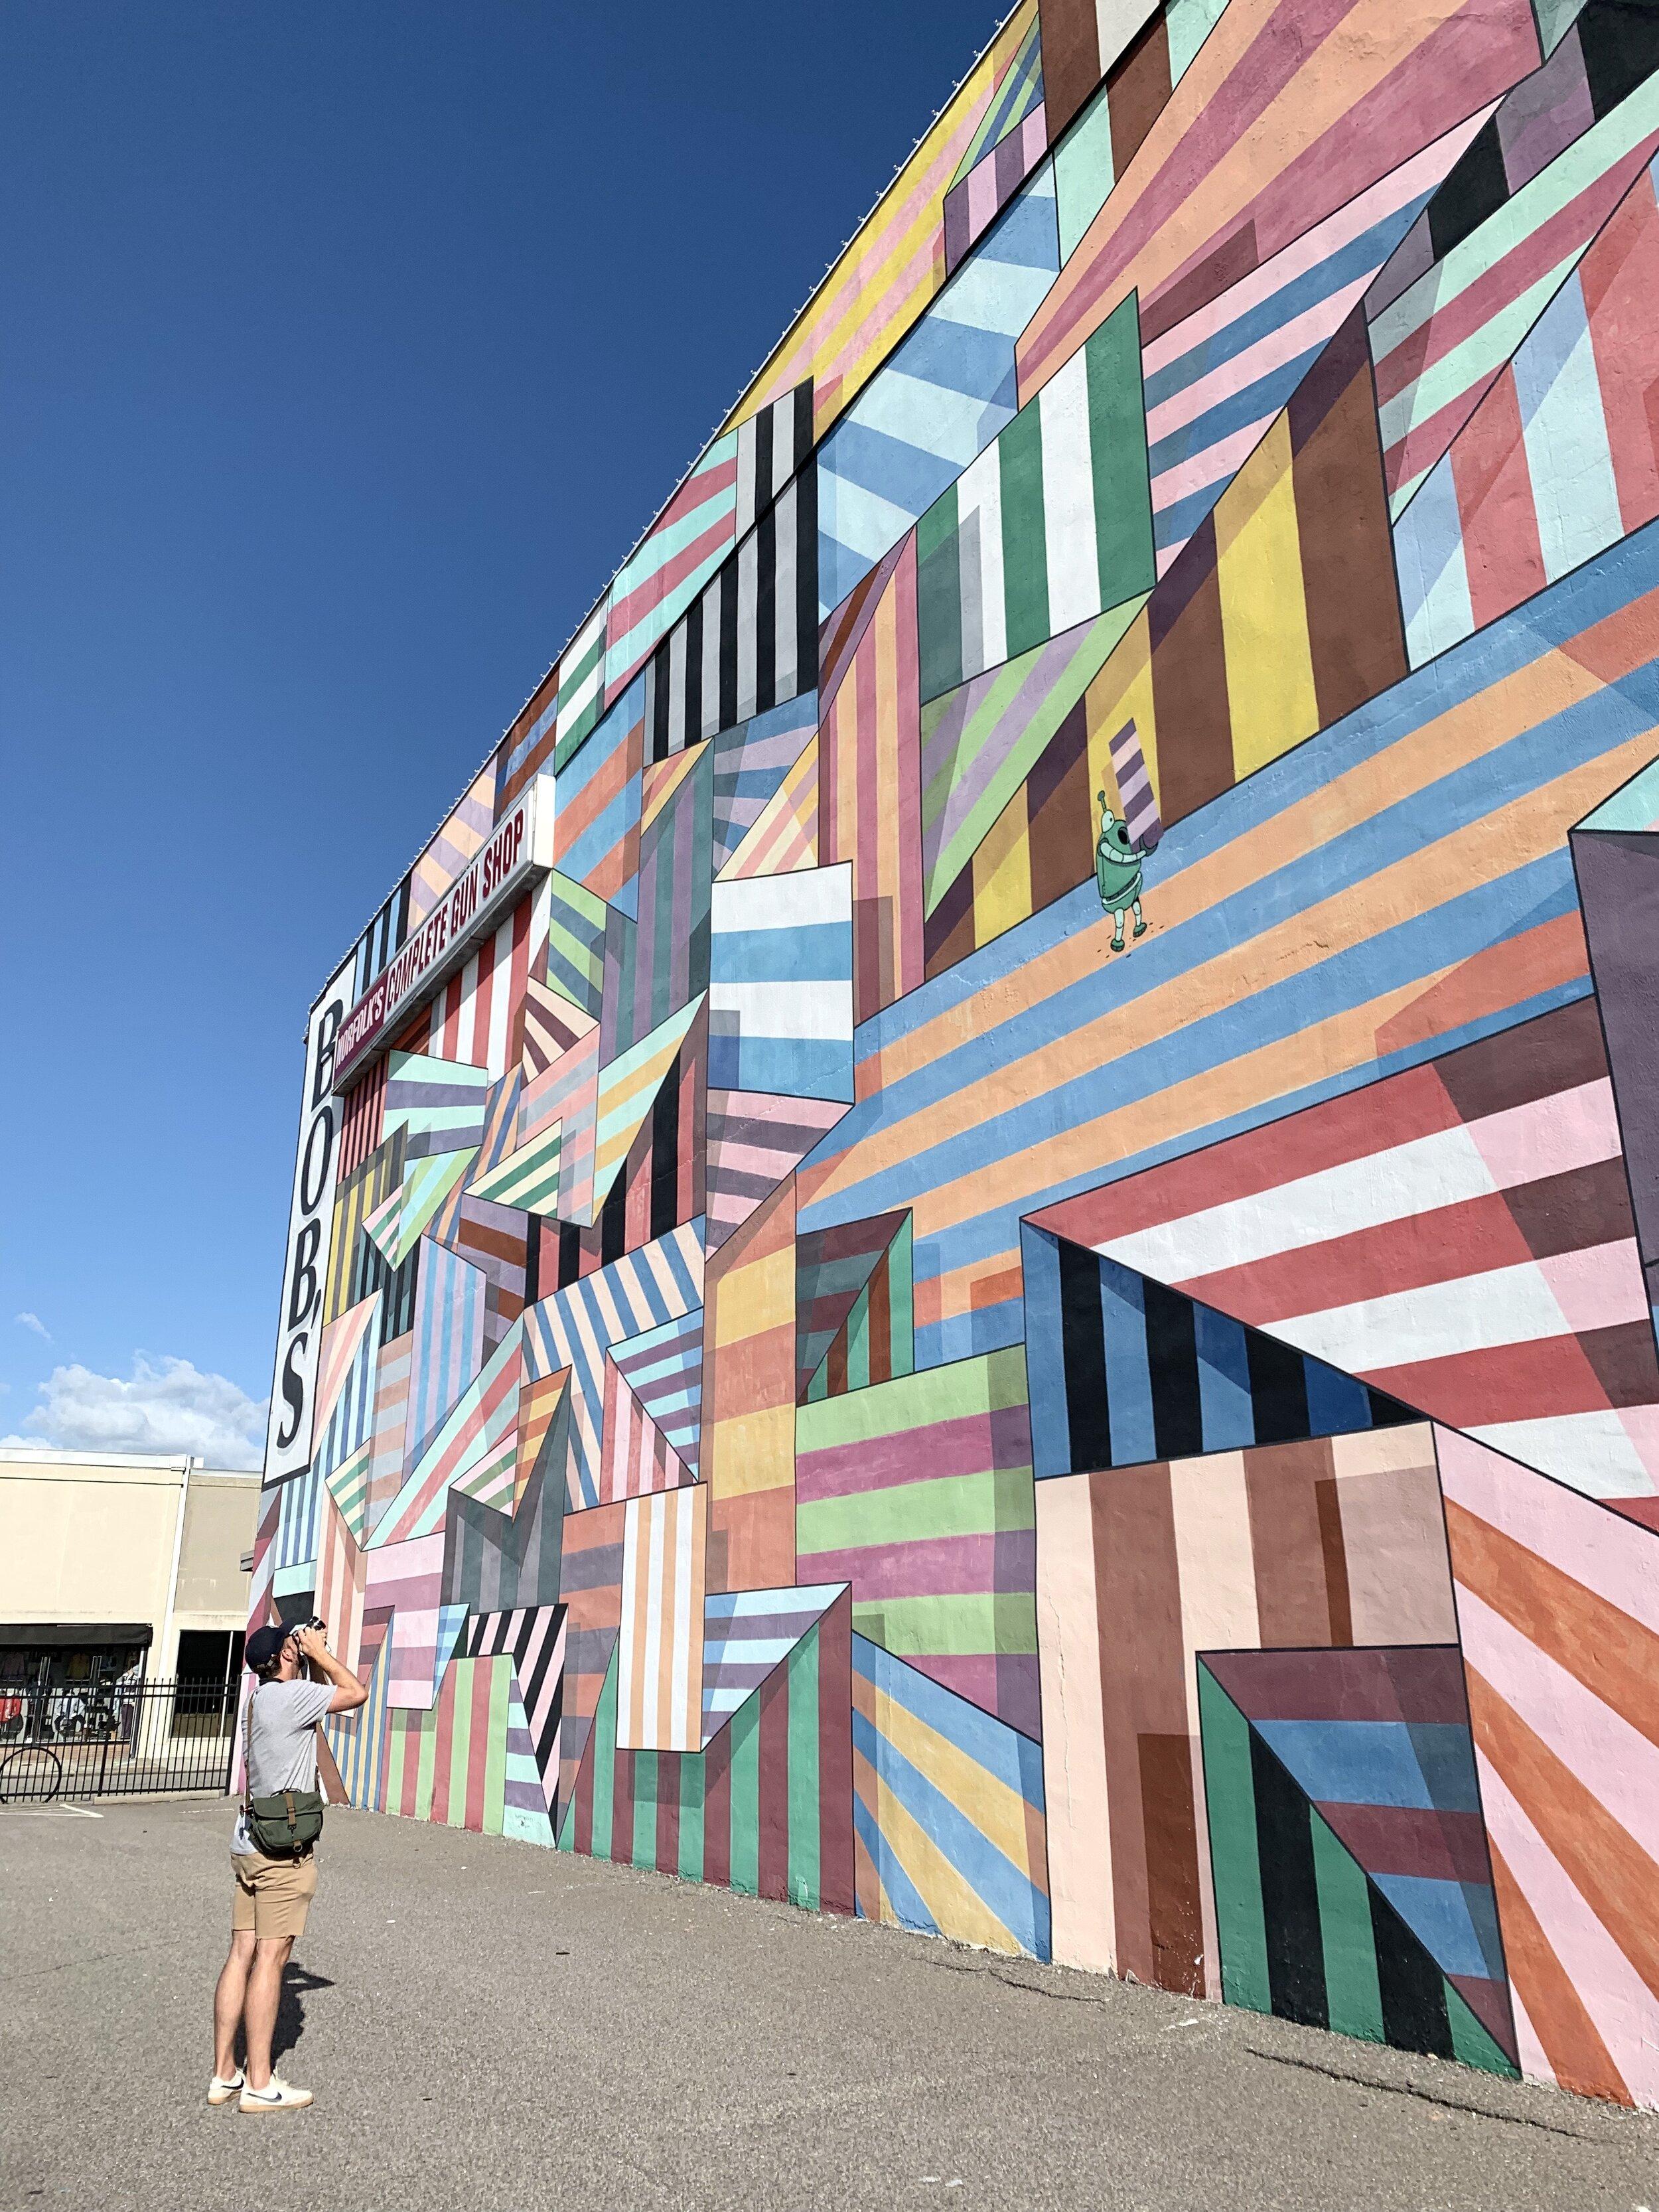 Some of the murals are MASSIVE!